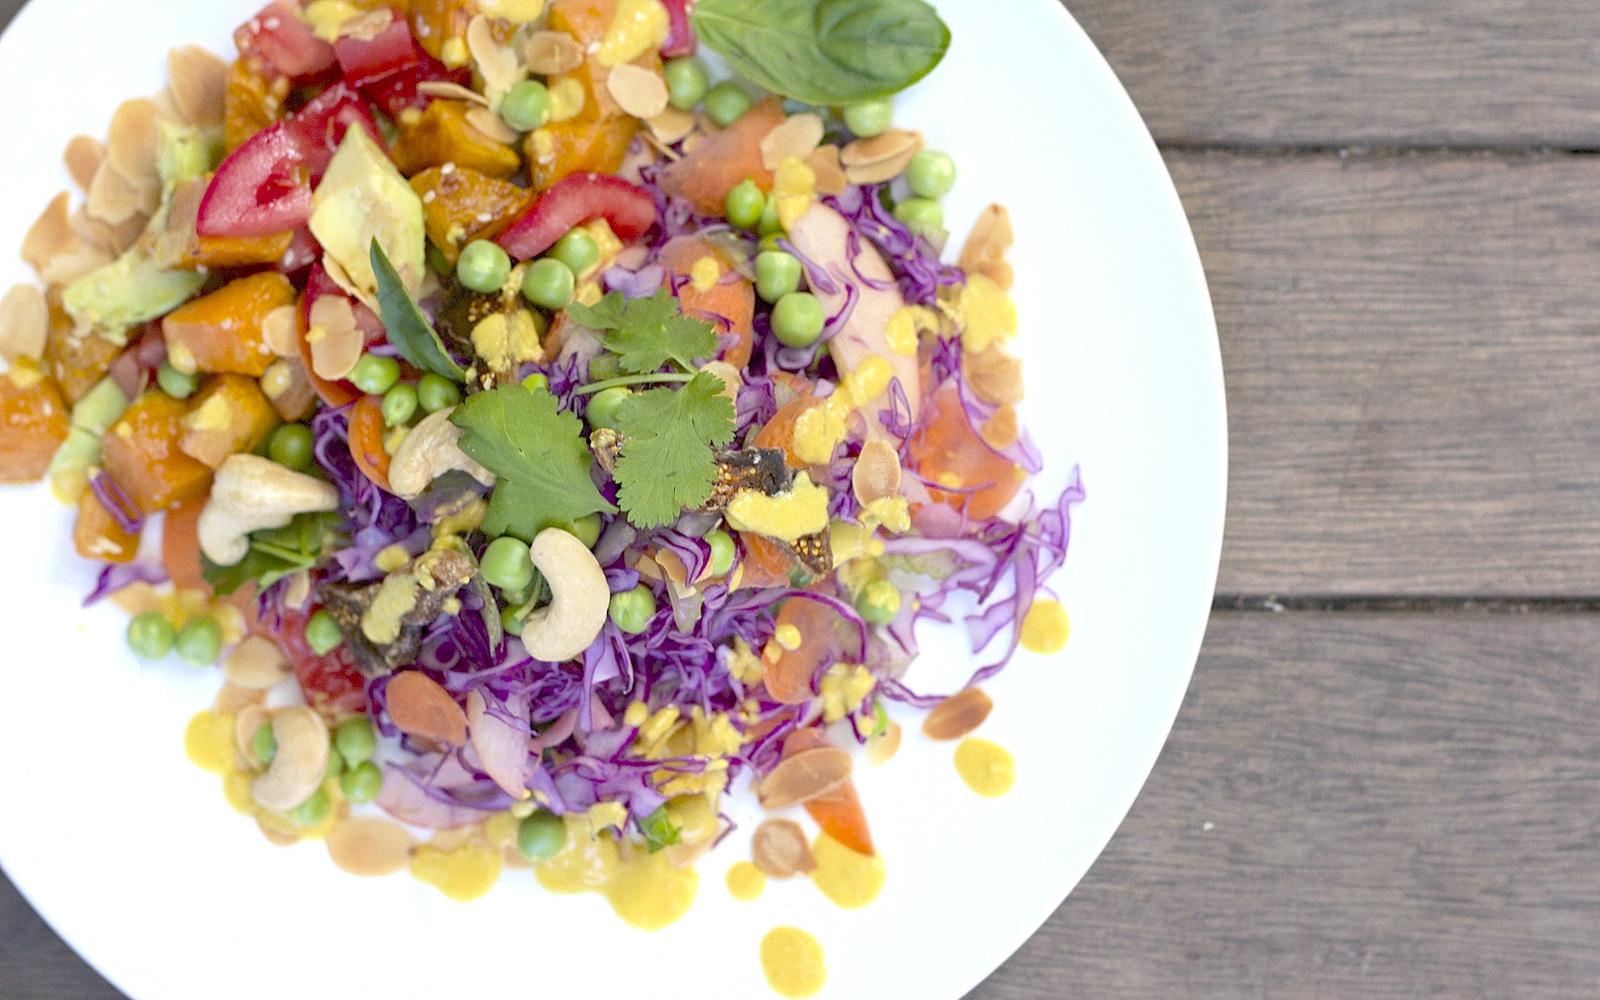 crunchy salad with sweet potato